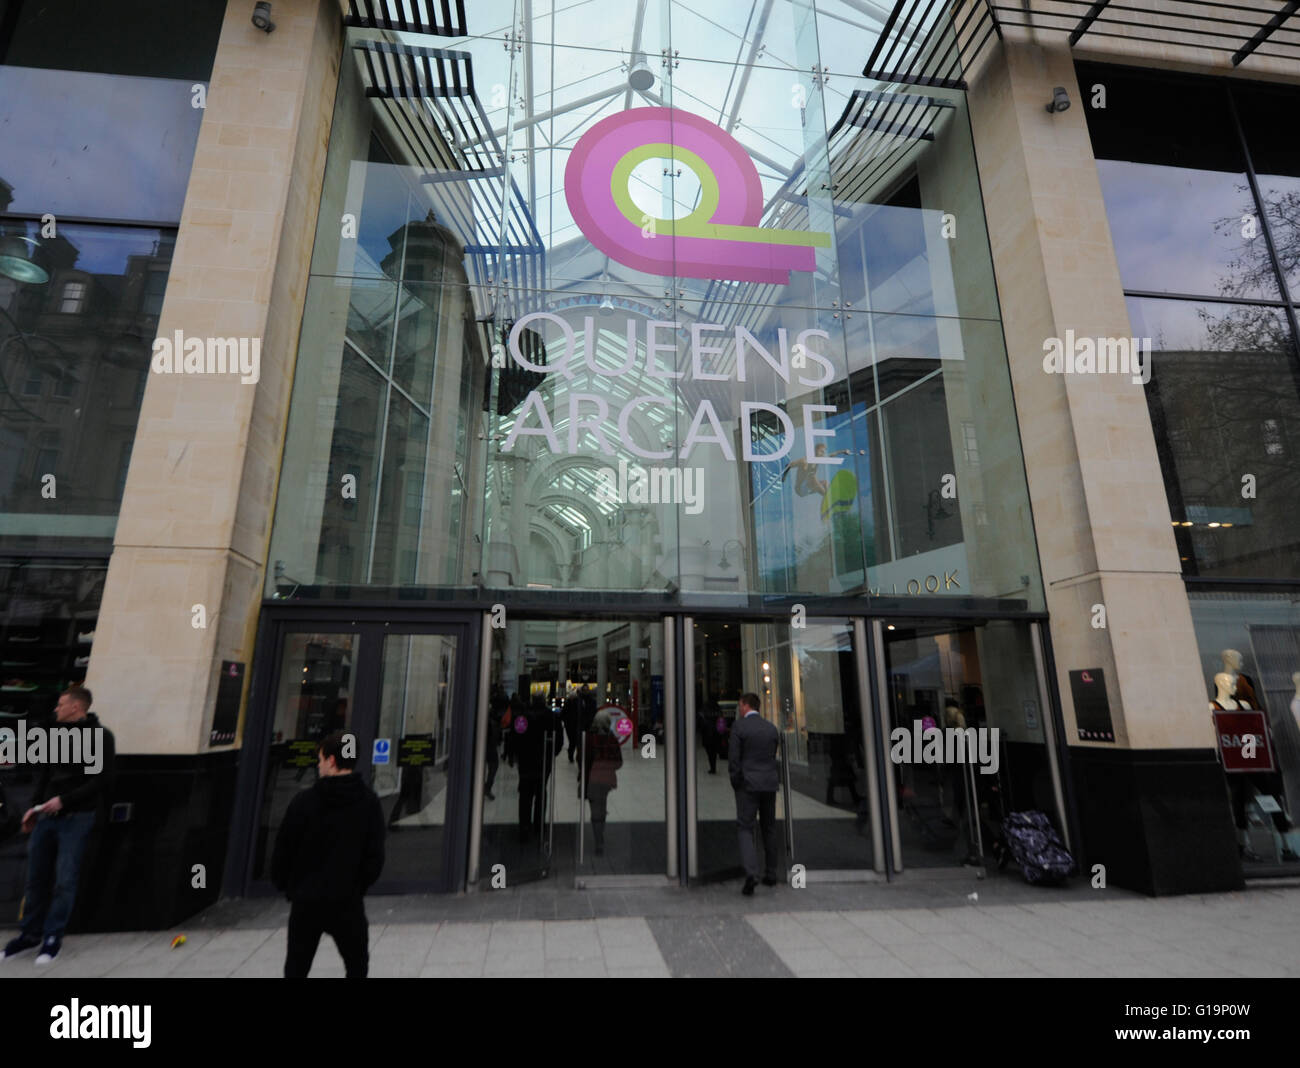 Queens Arcade,shopping centre,UK - Stock Image